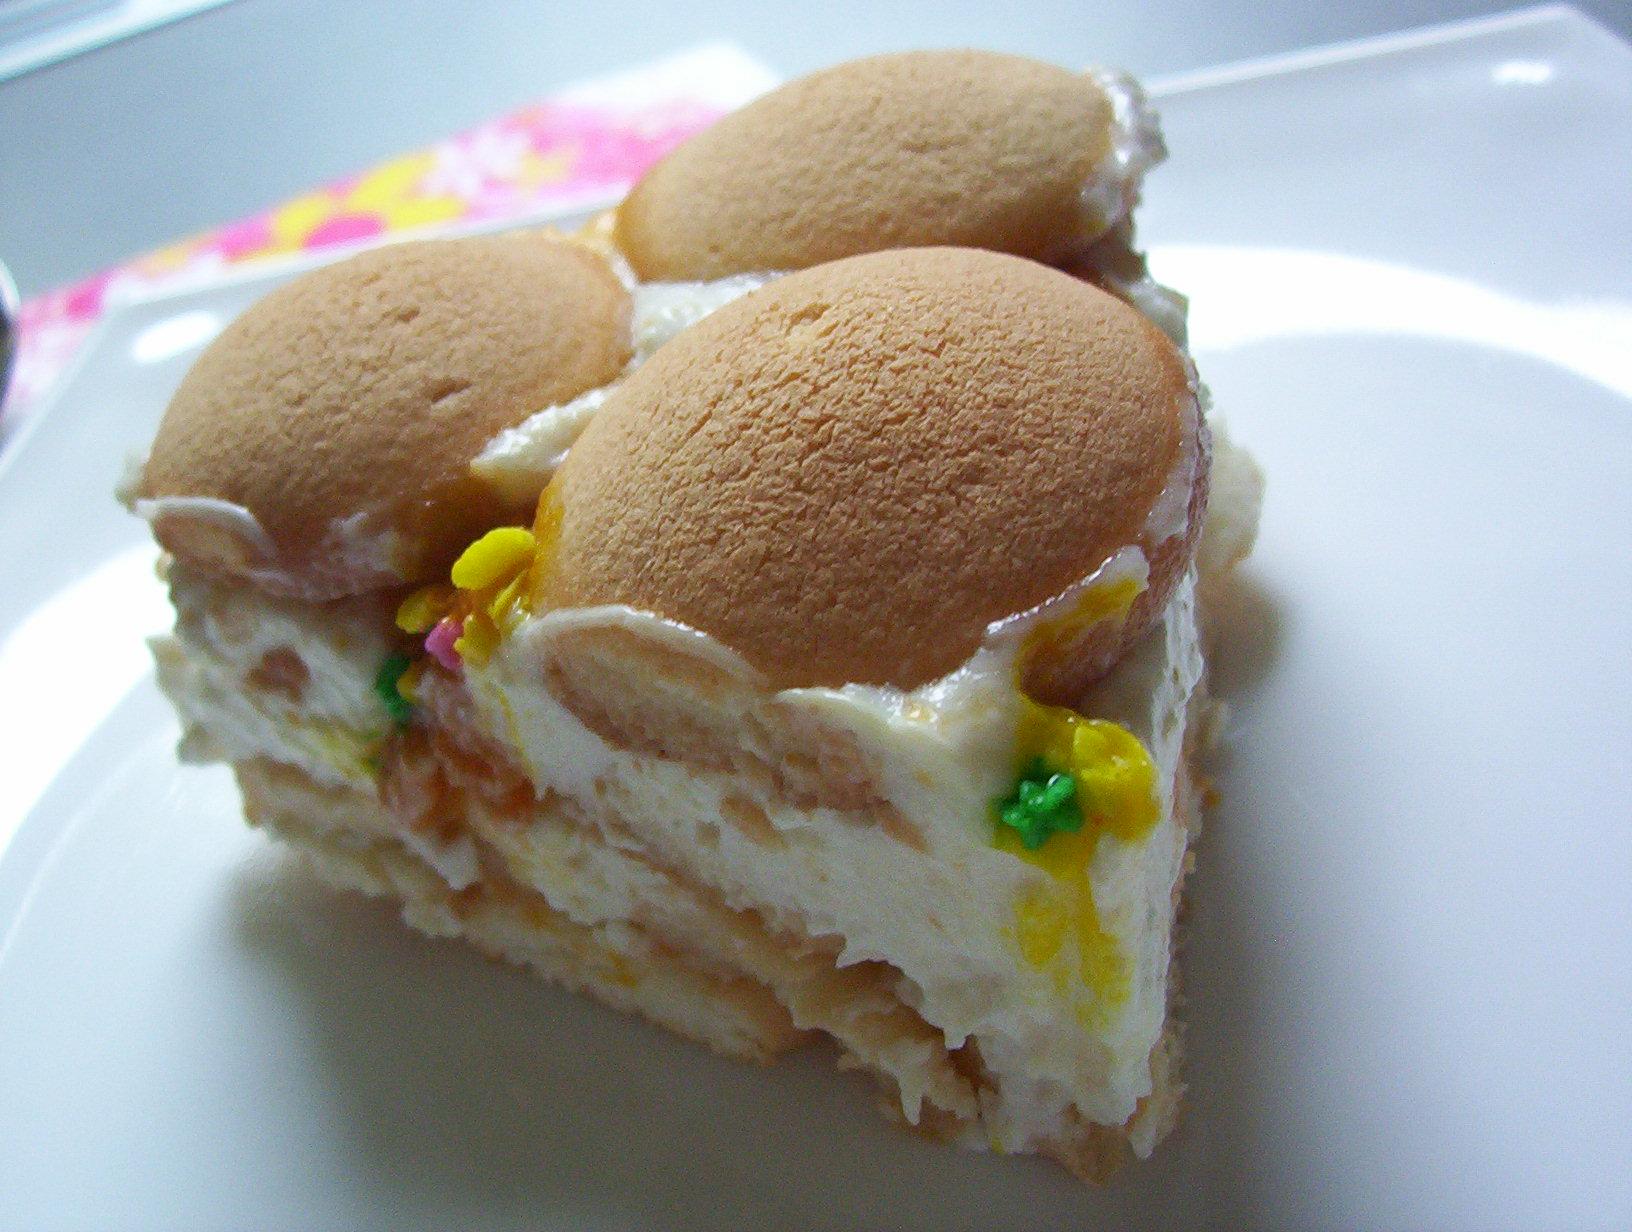 Mléčný piškotový dort